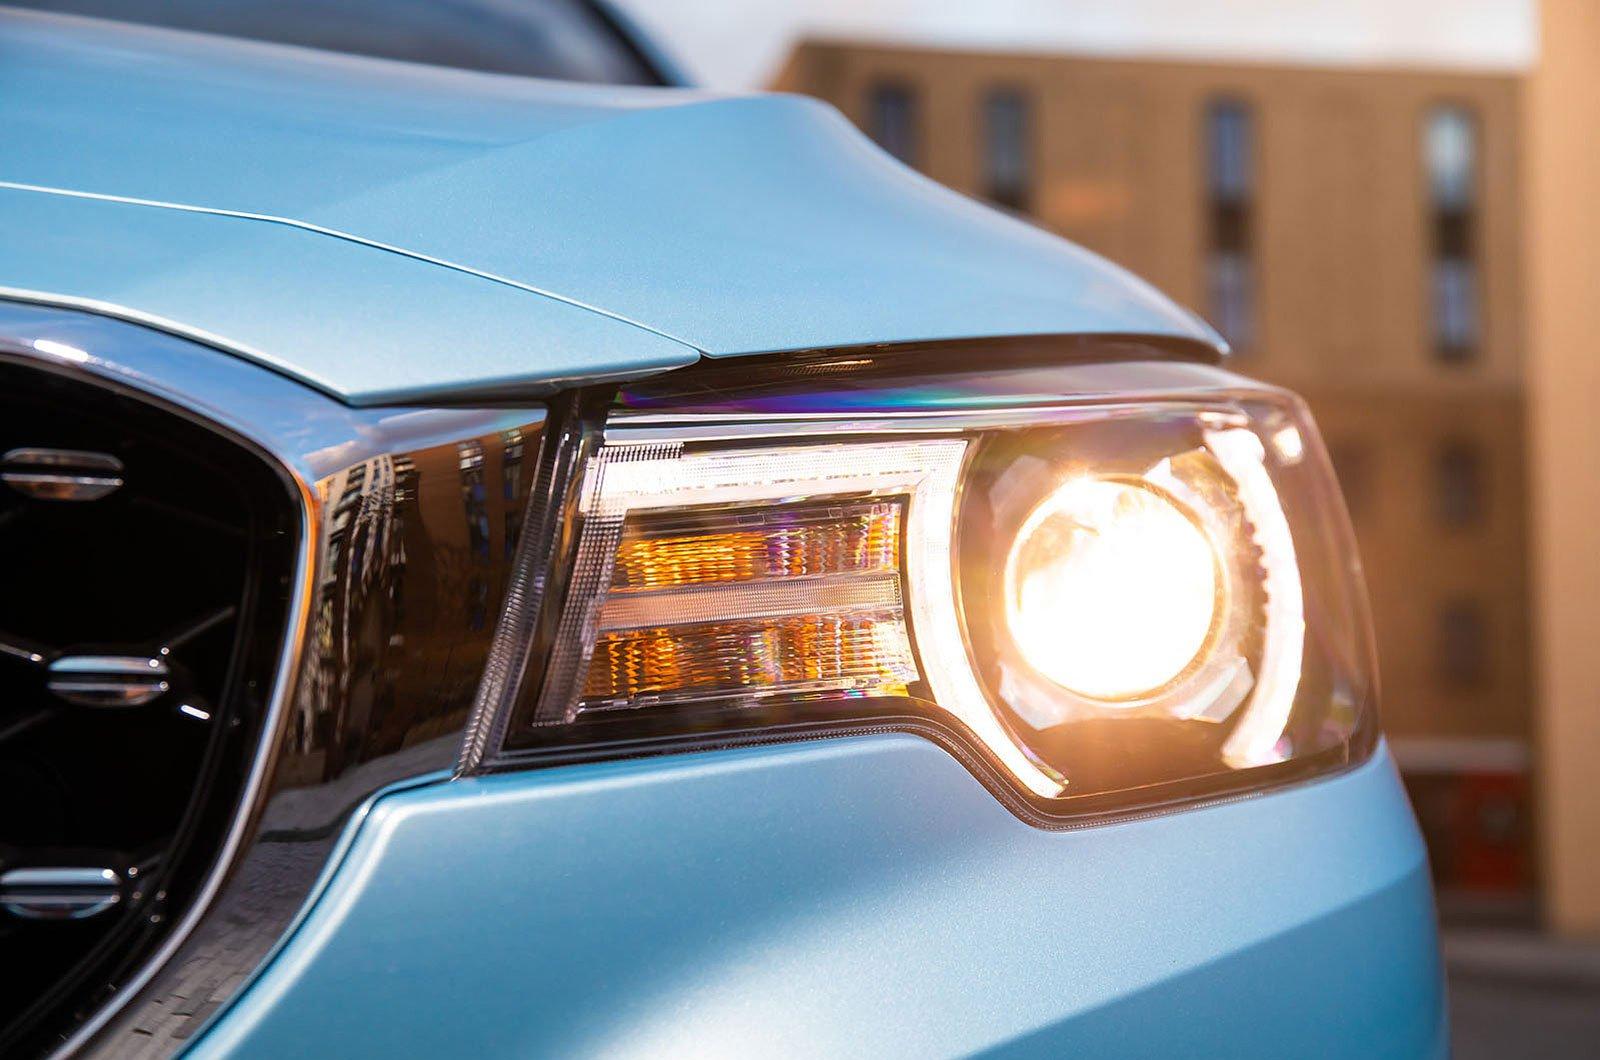 MG ZS Electric headlights